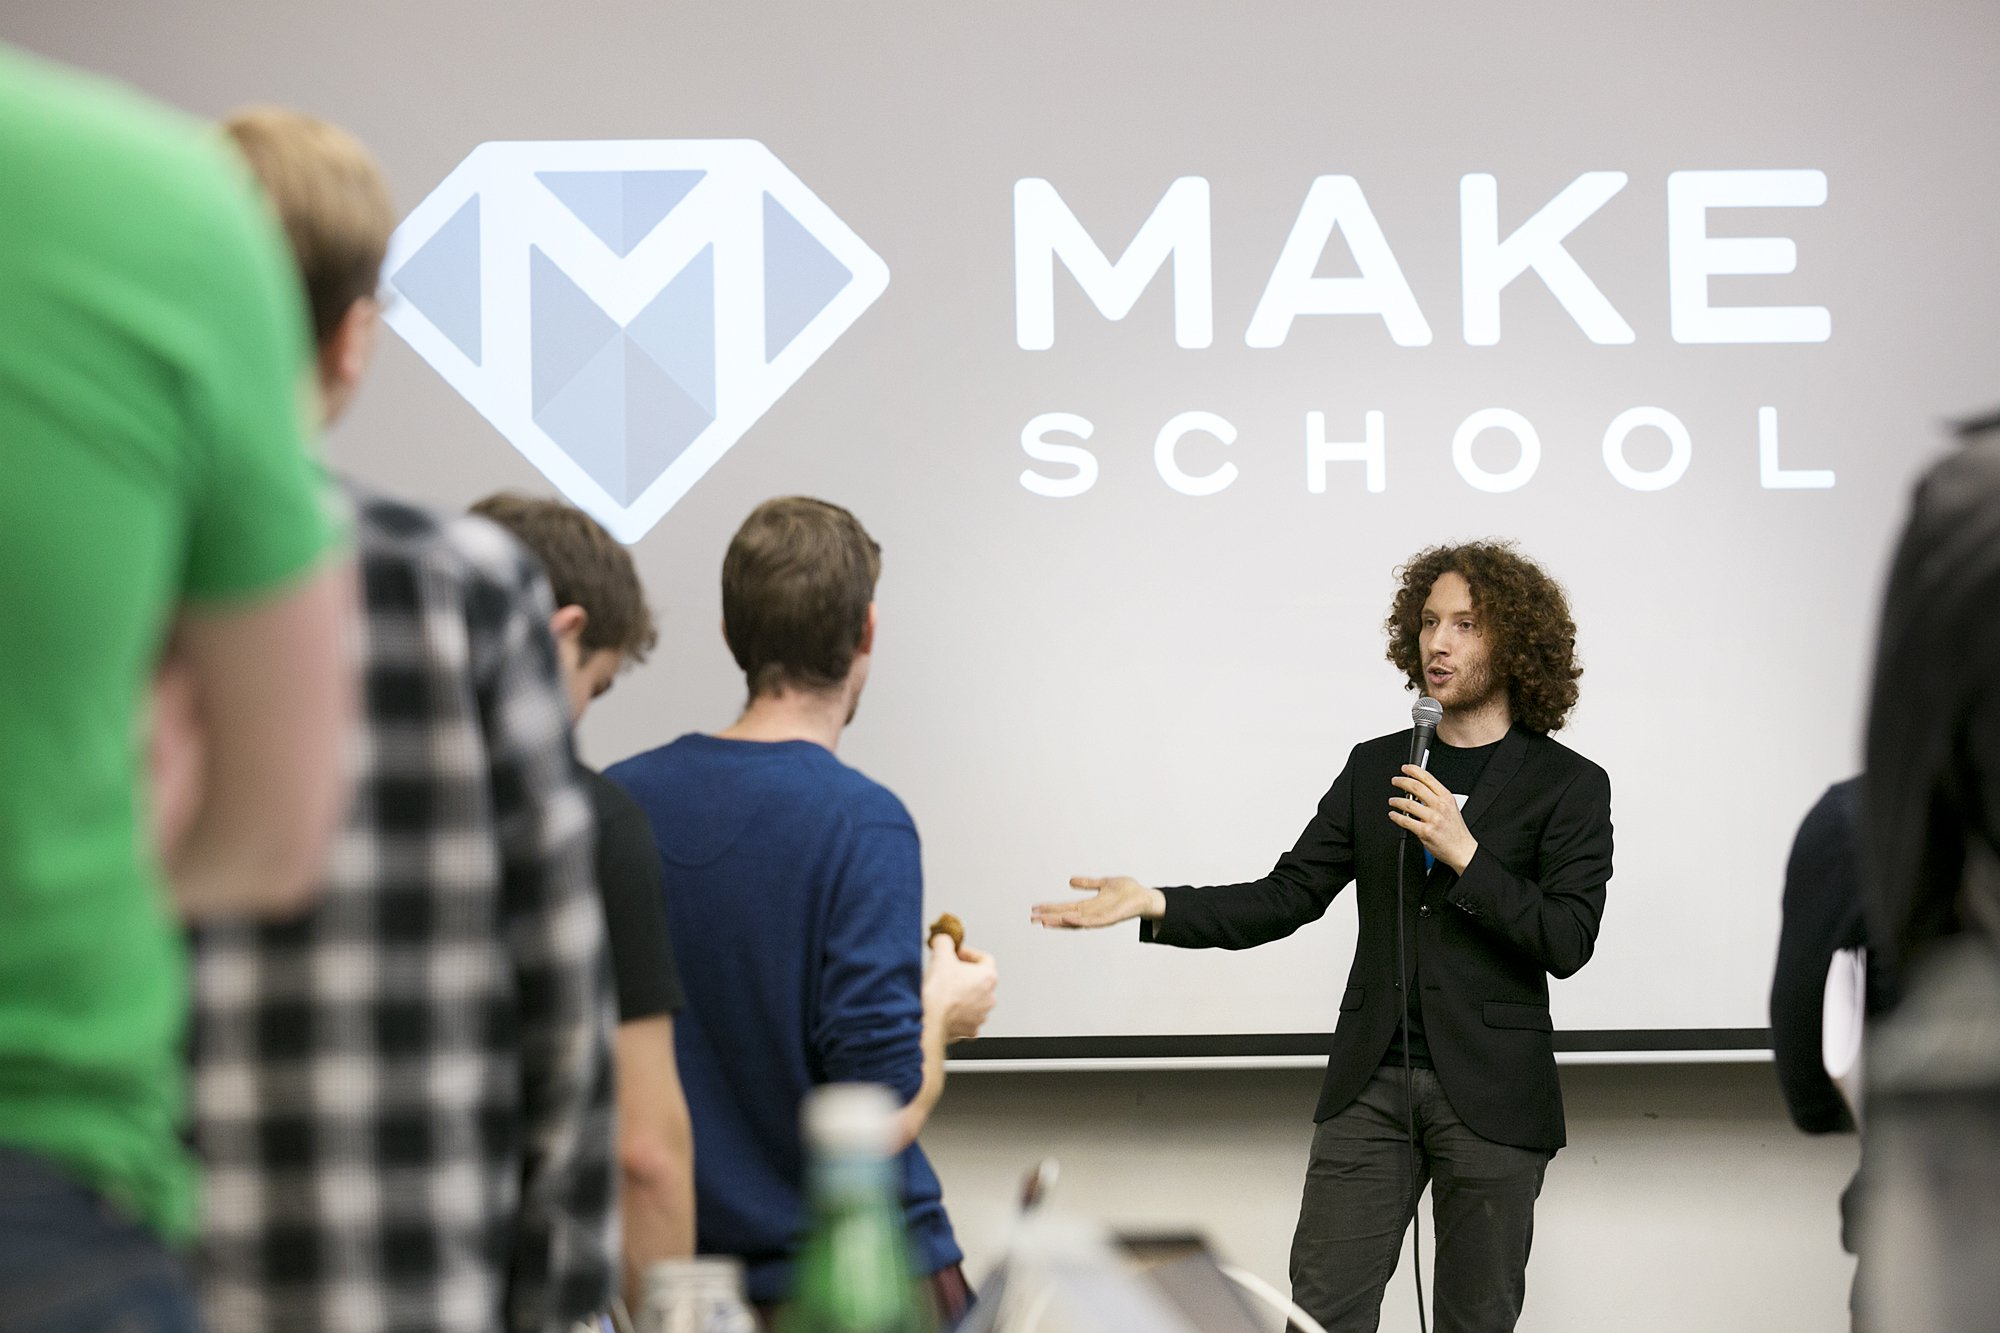 Jeremy Rossmann 是 Make School 的共同創辦人。圖片來源:Make School。